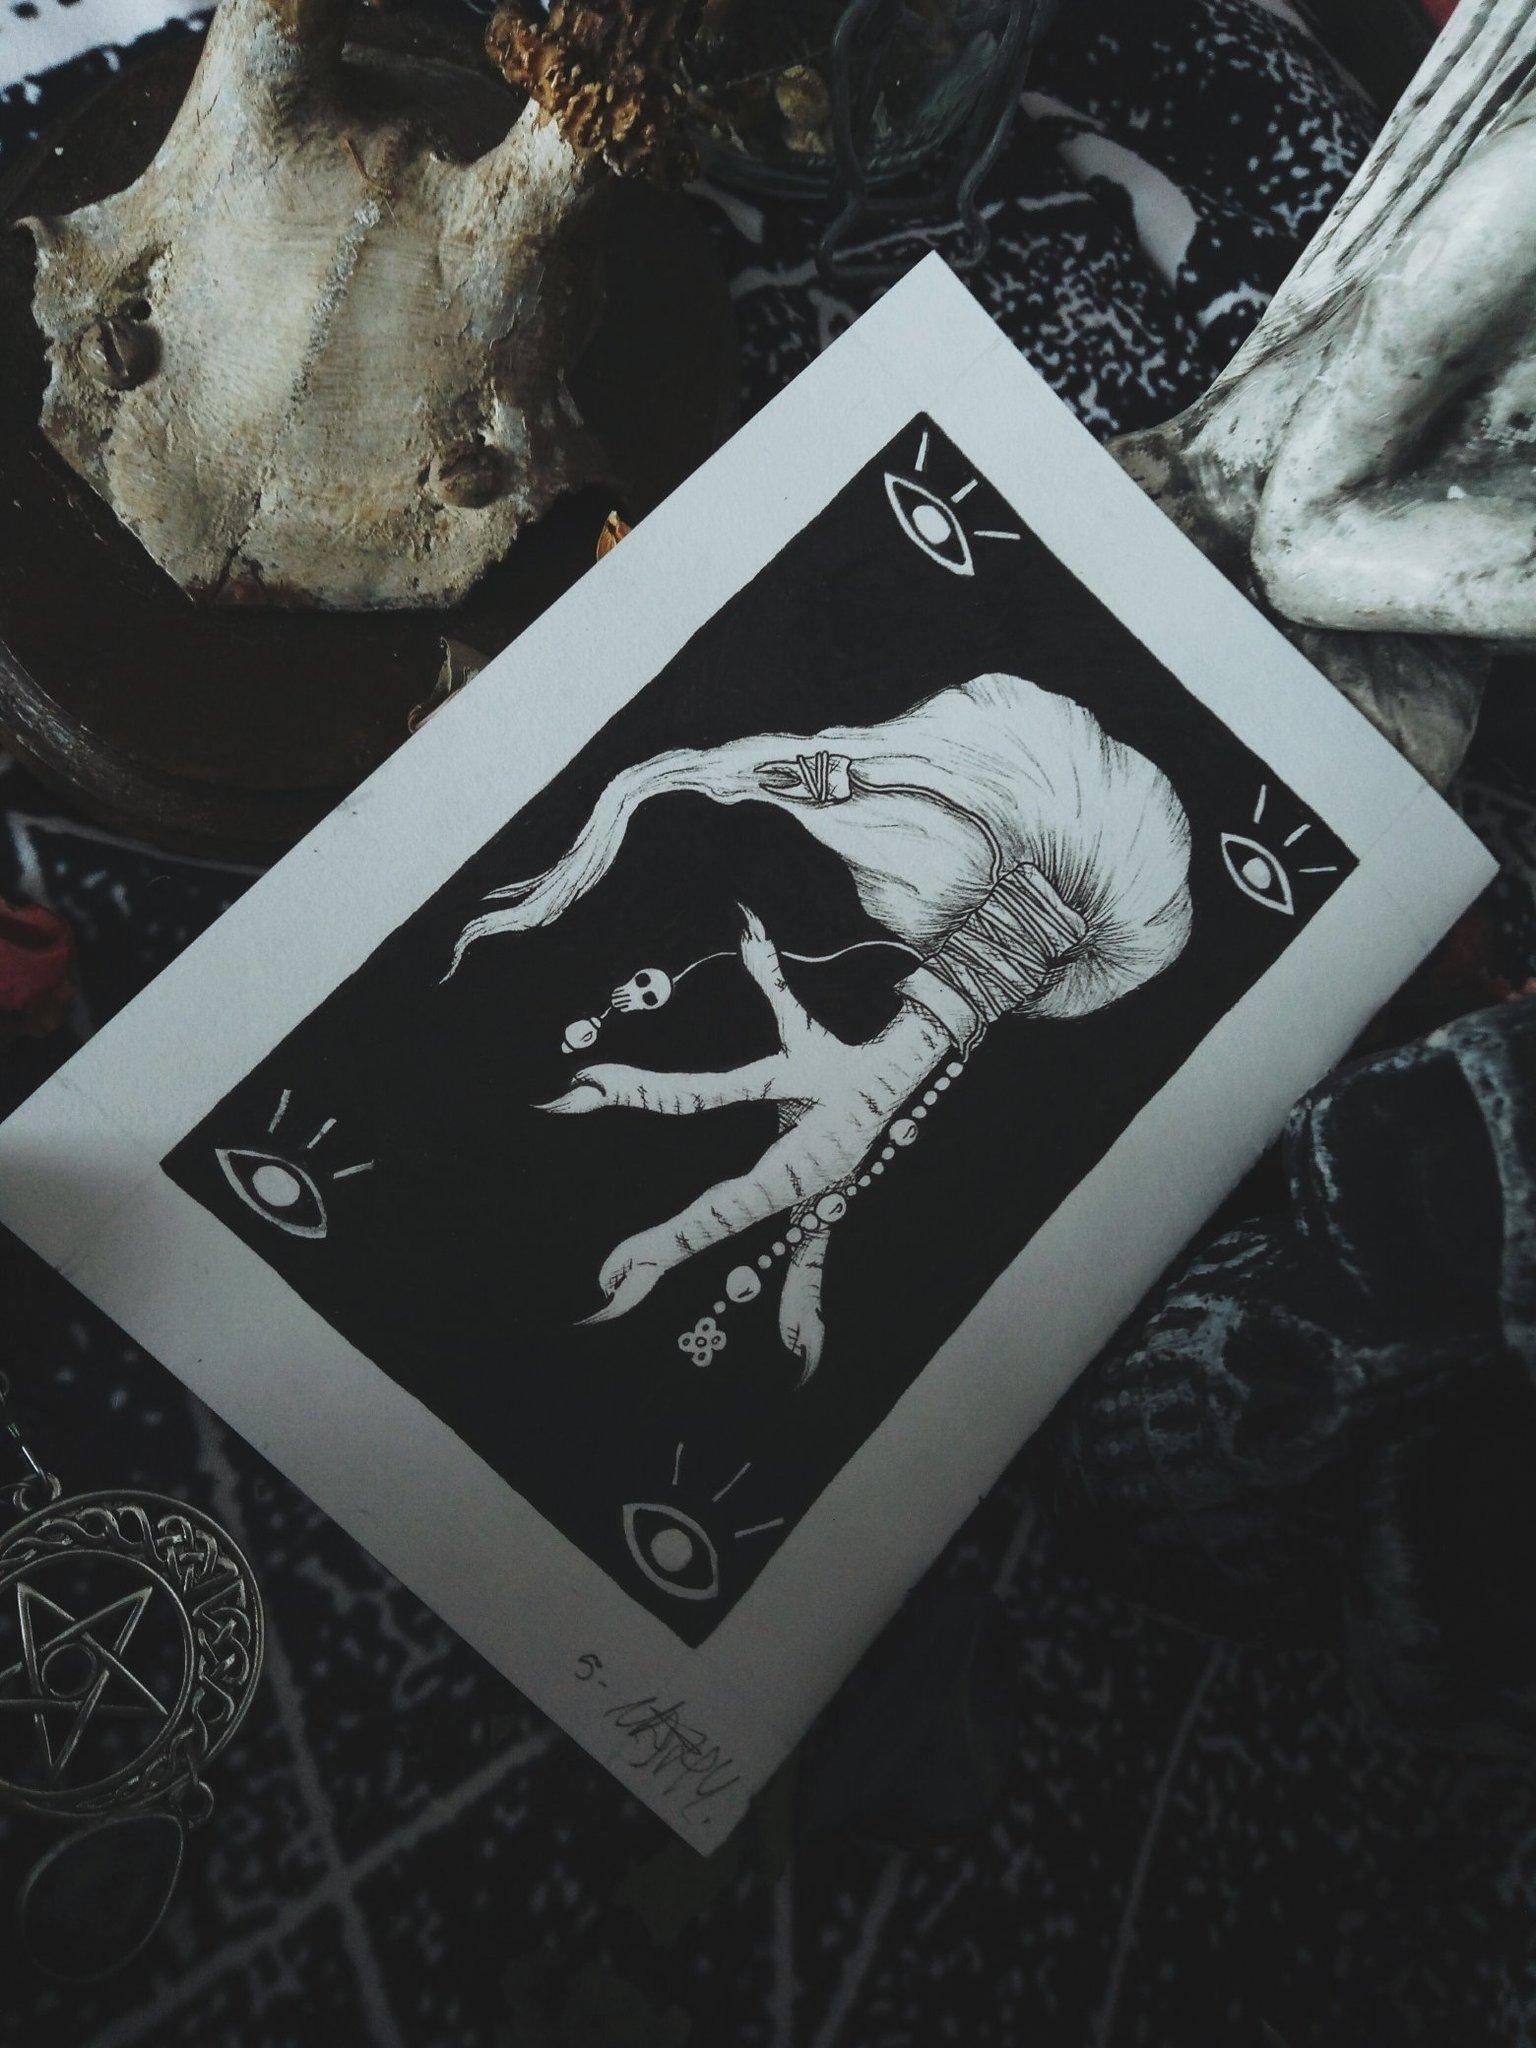 Poulet – Colournathy, Inktober 2018